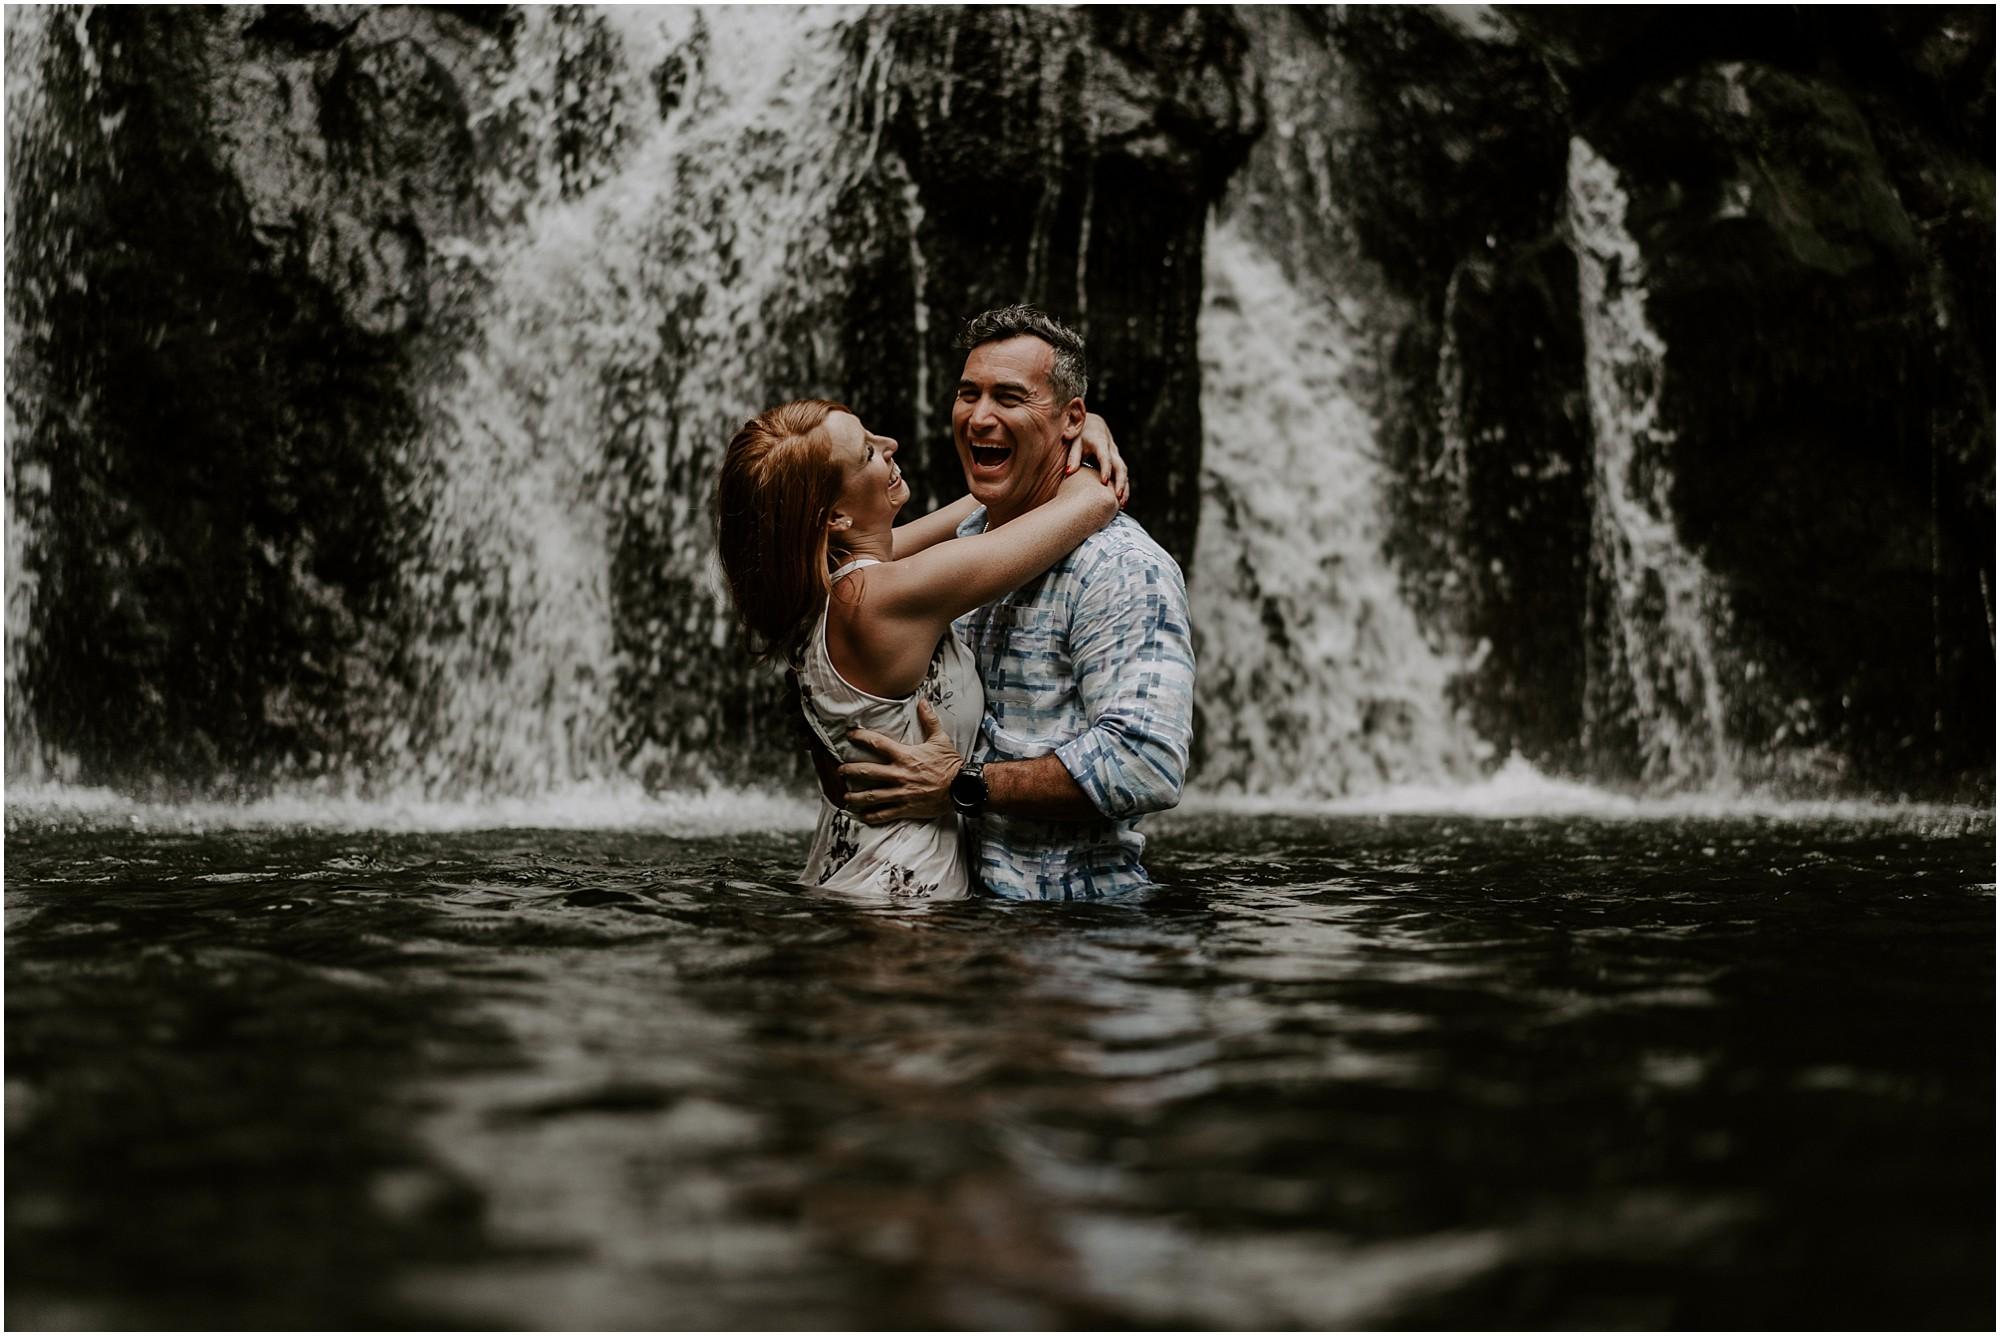 big-island-couples-adventure-session-waterfall-photoshoot_0012.jpg